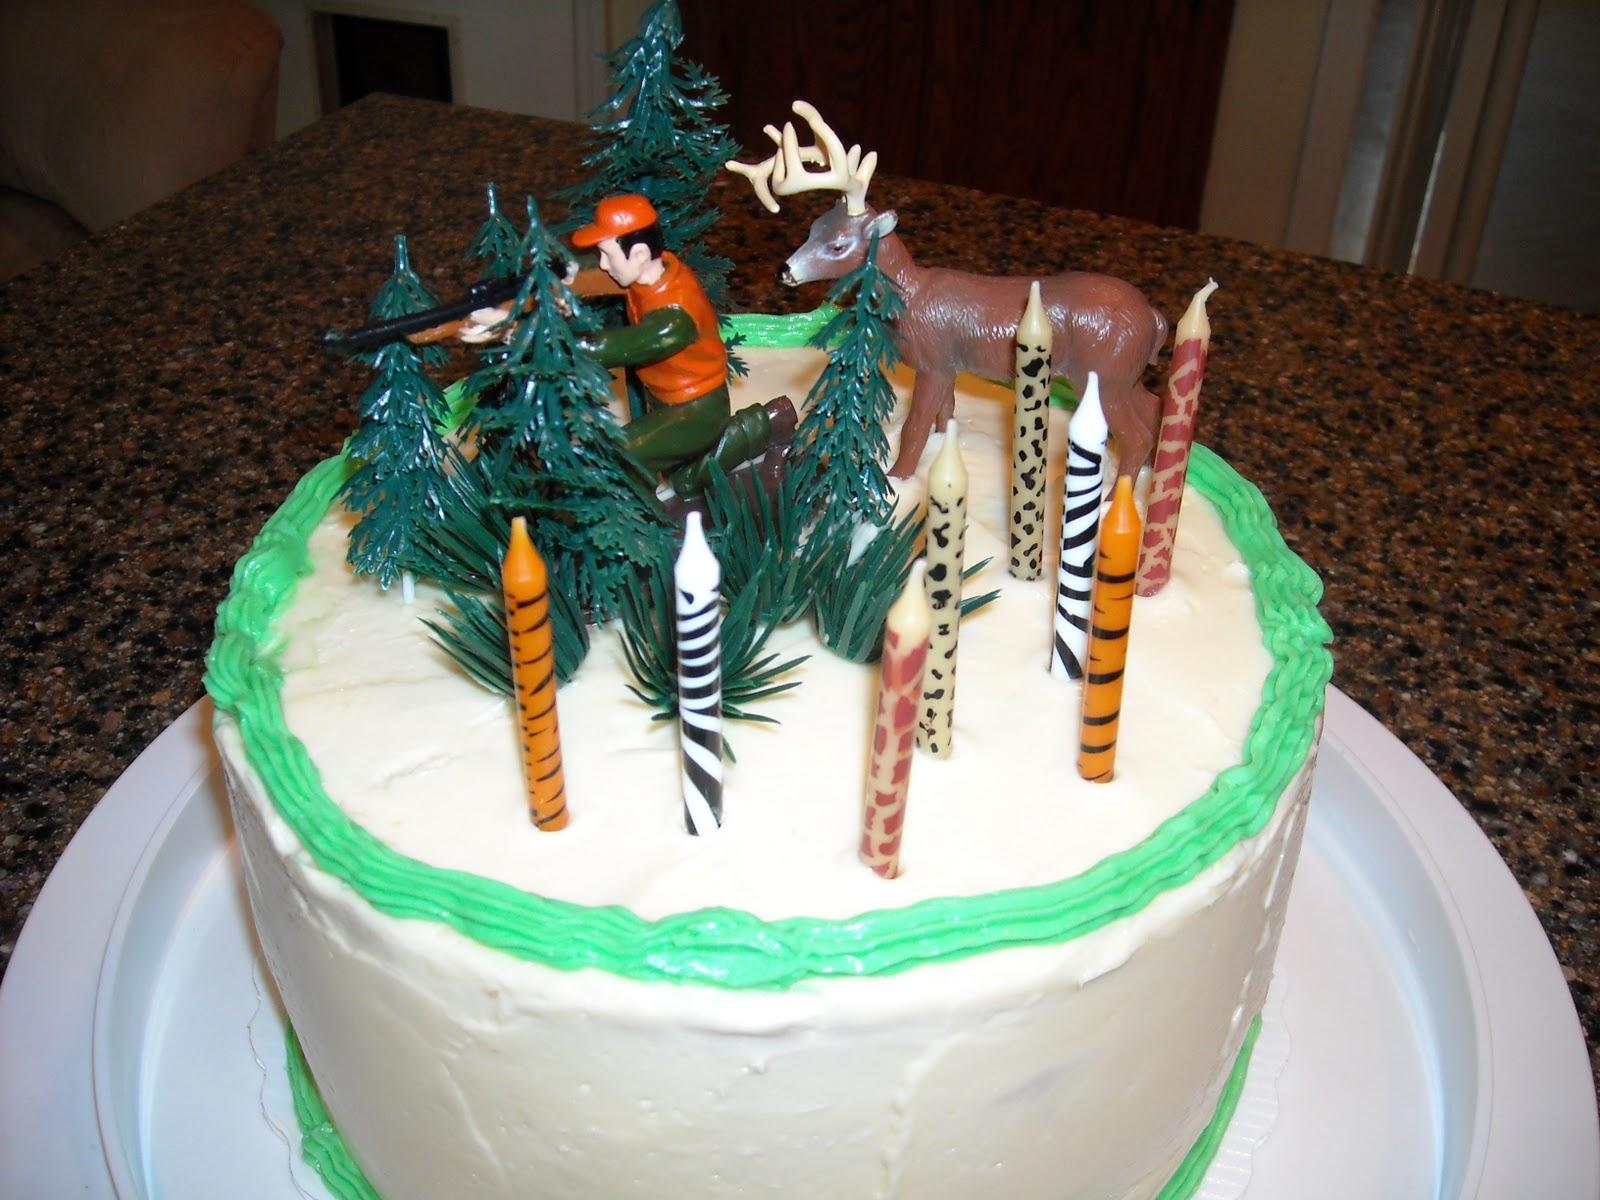 Baking Daze in Lake Arrowhead: Happy Birthday Chuck: This One was Fun!